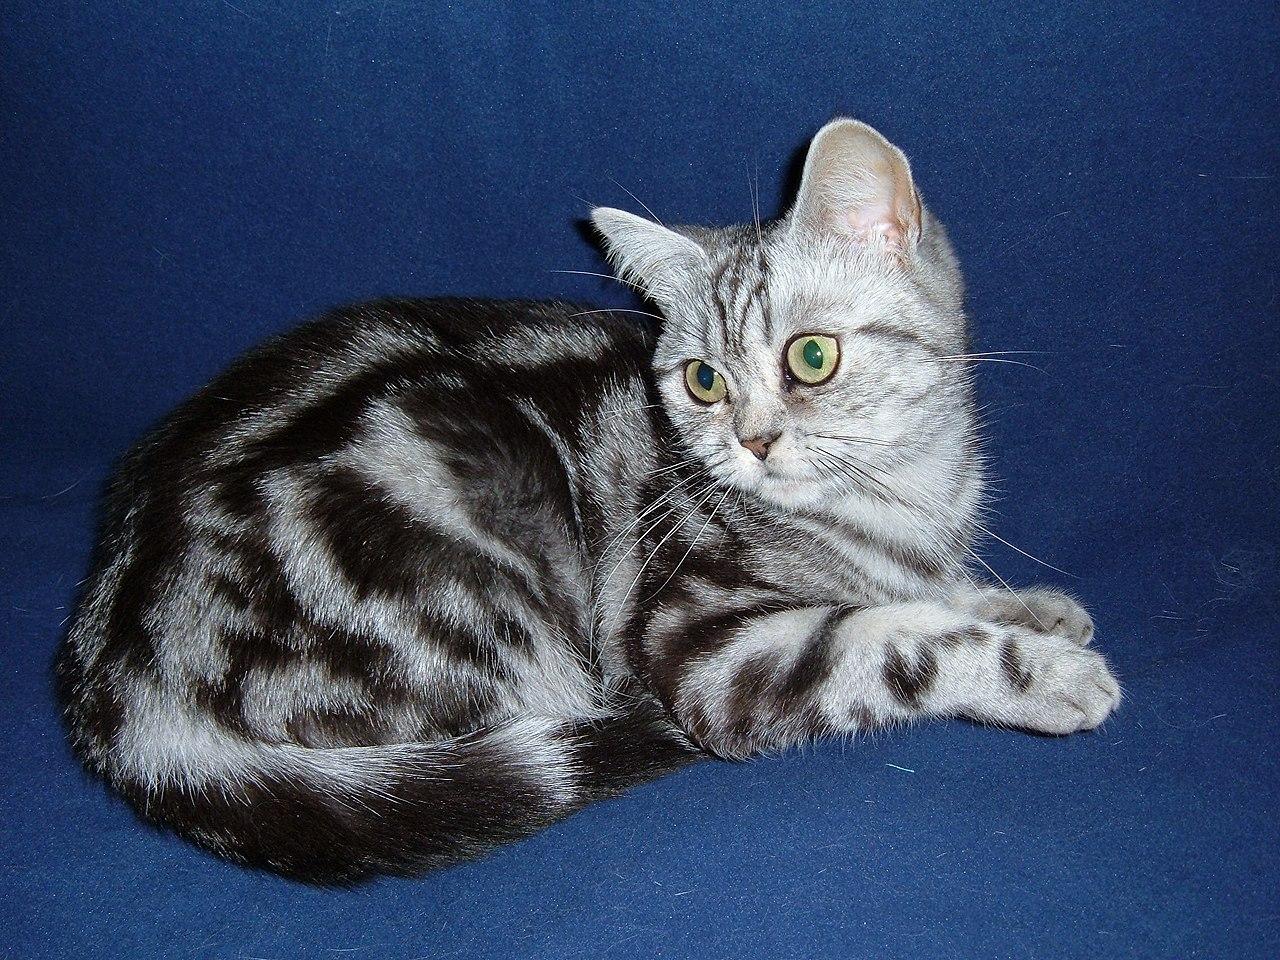 File:British Shorthair, Classic Tabby.jpg - Wikimedia Commons